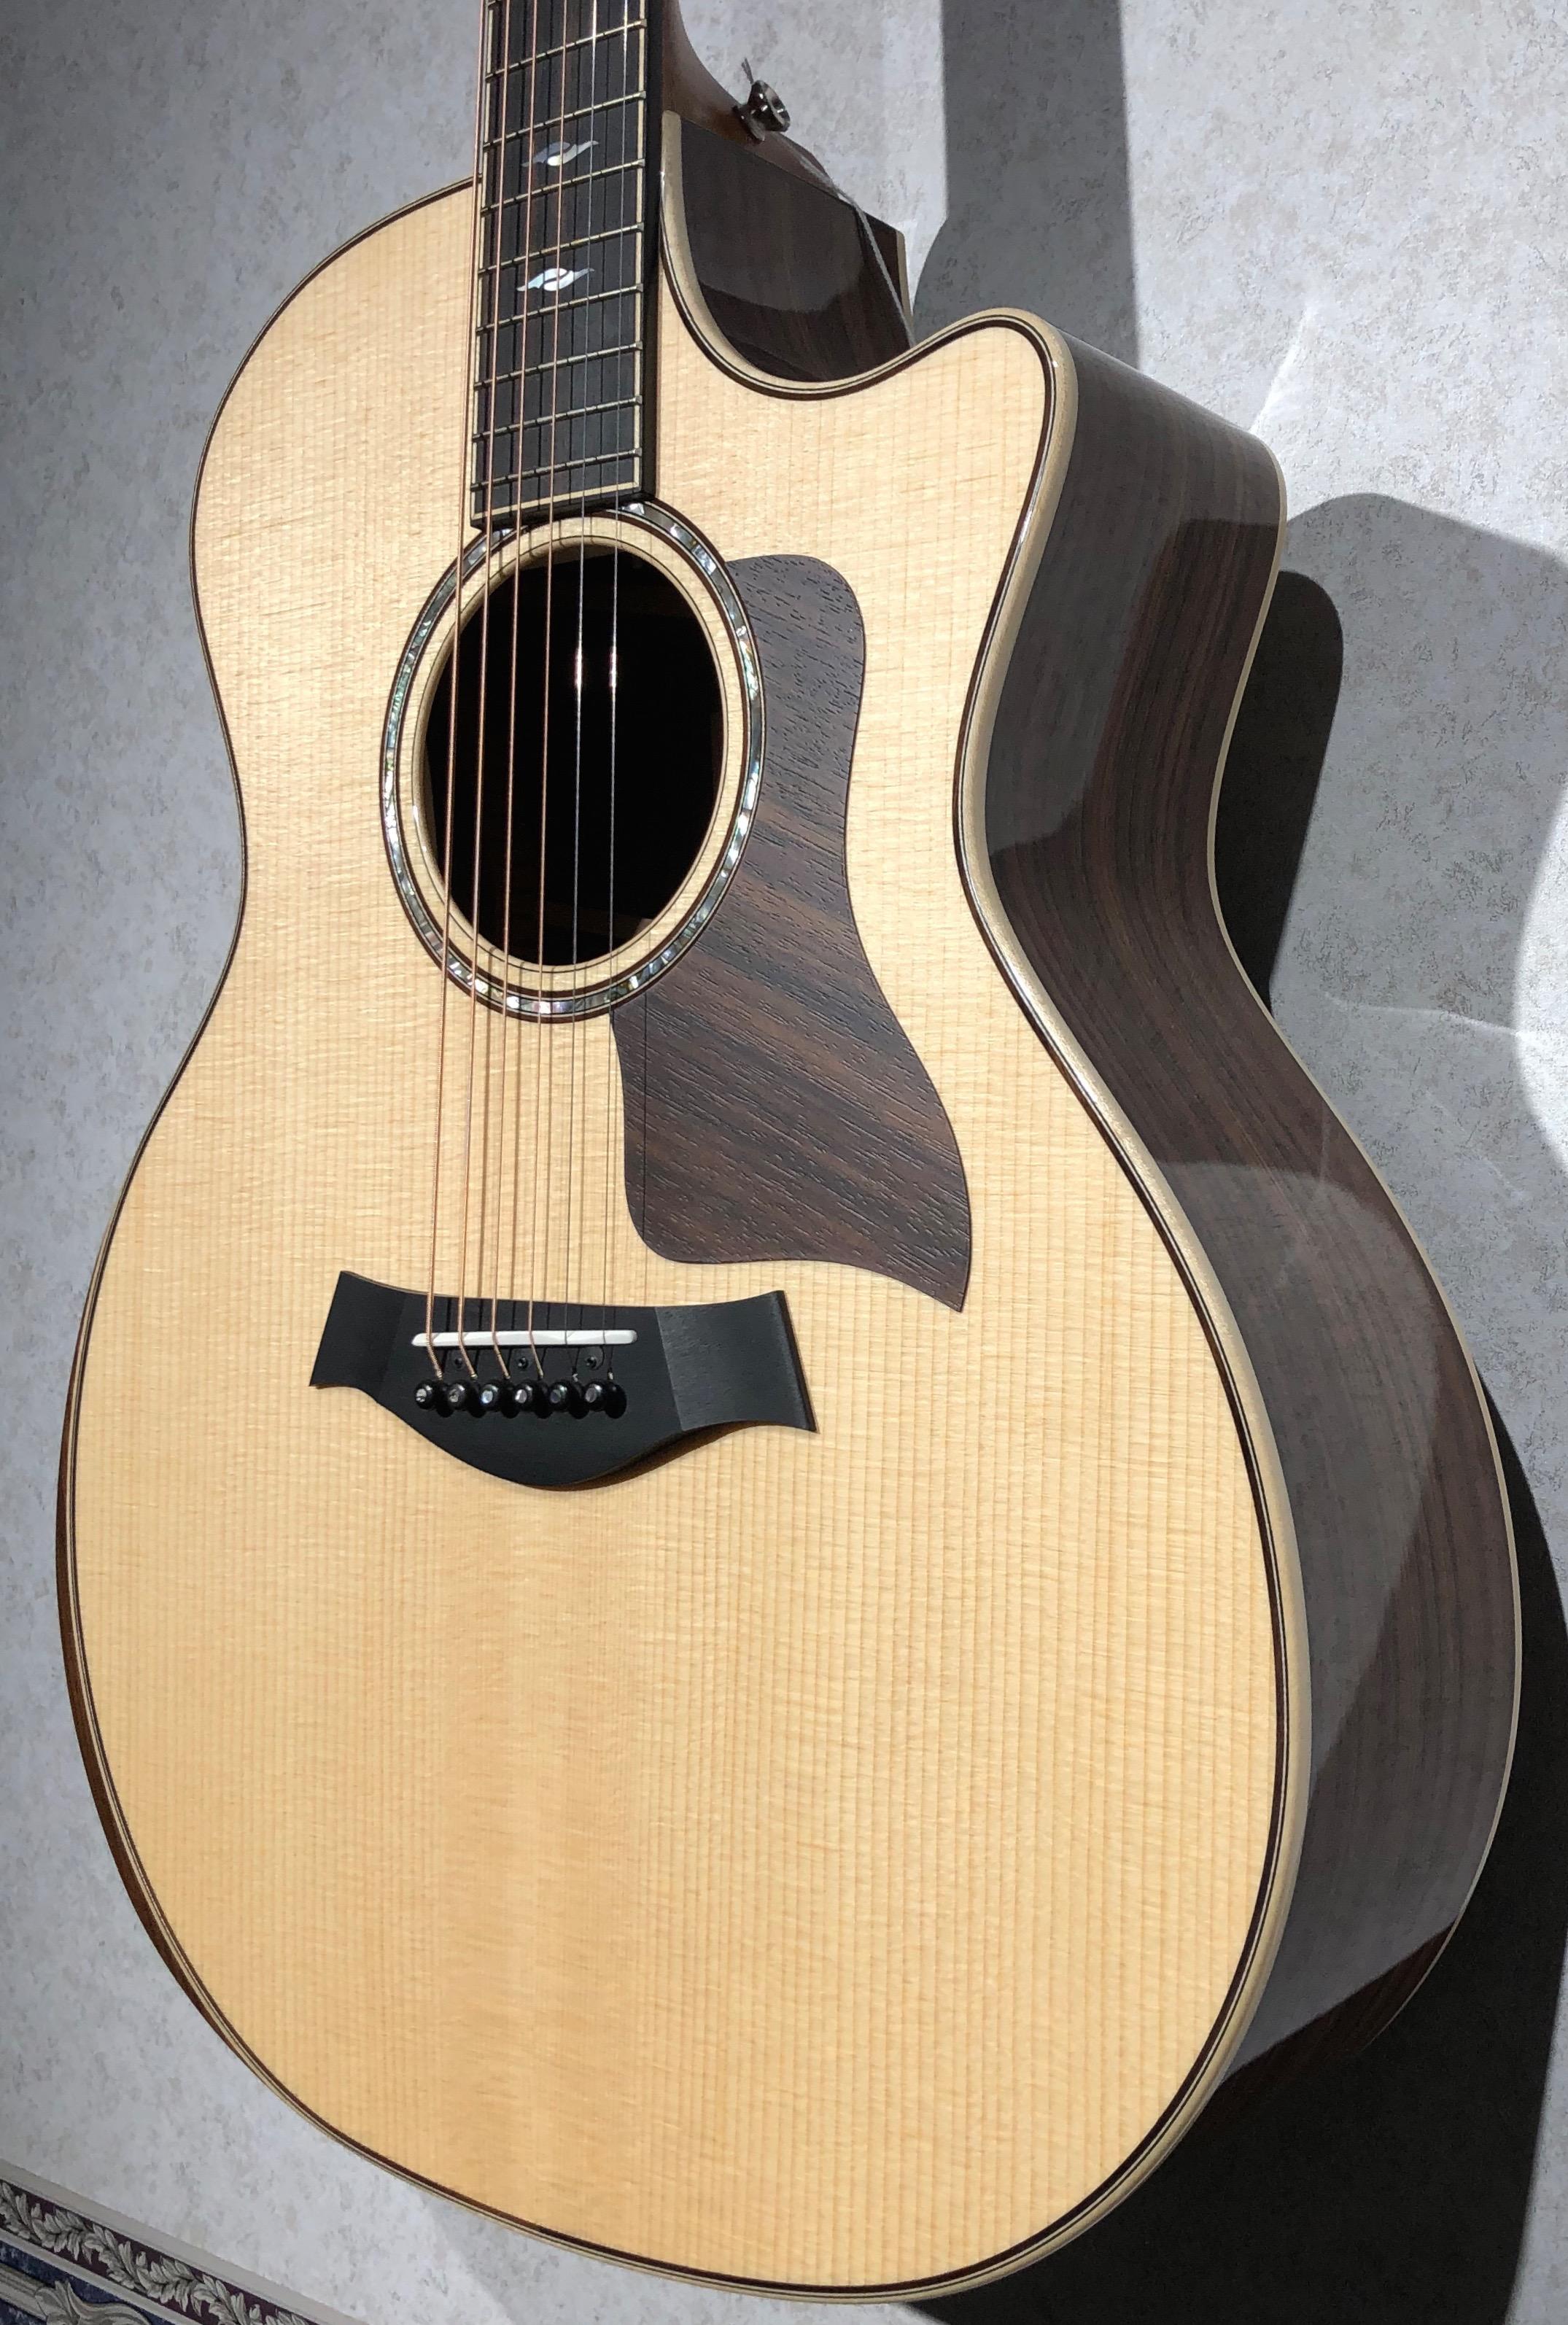 taylor guitars 814ce dlx v class bracing legacy music. Black Bedroom Furniture Sets. Home Design Ideas